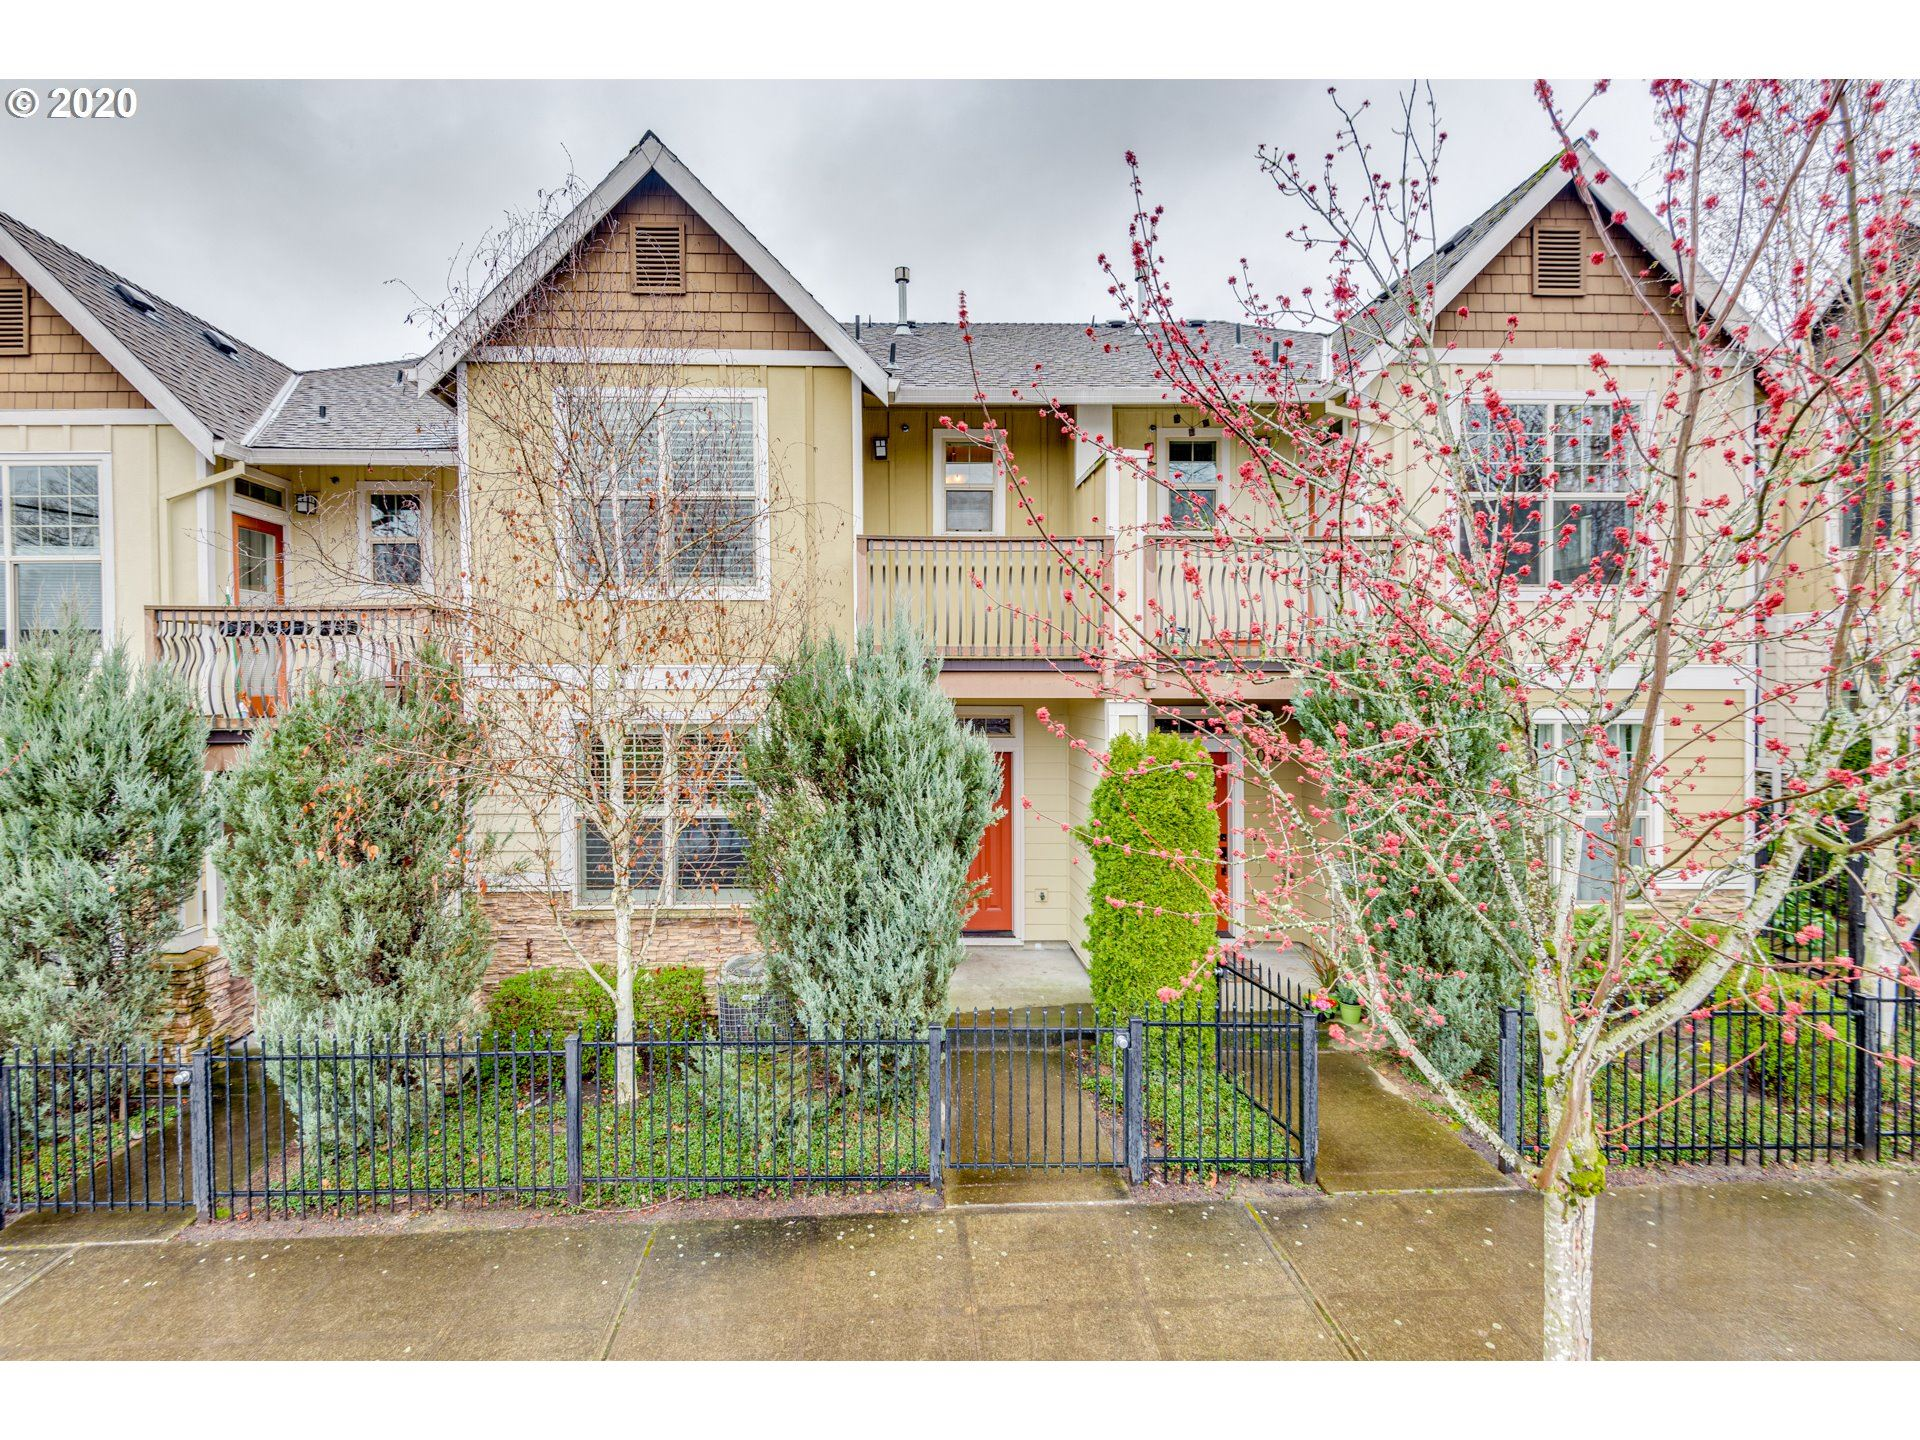 7036 NE GARFIELD AVE #12-2, Portland, OR 97211 - MLS#: 20646429